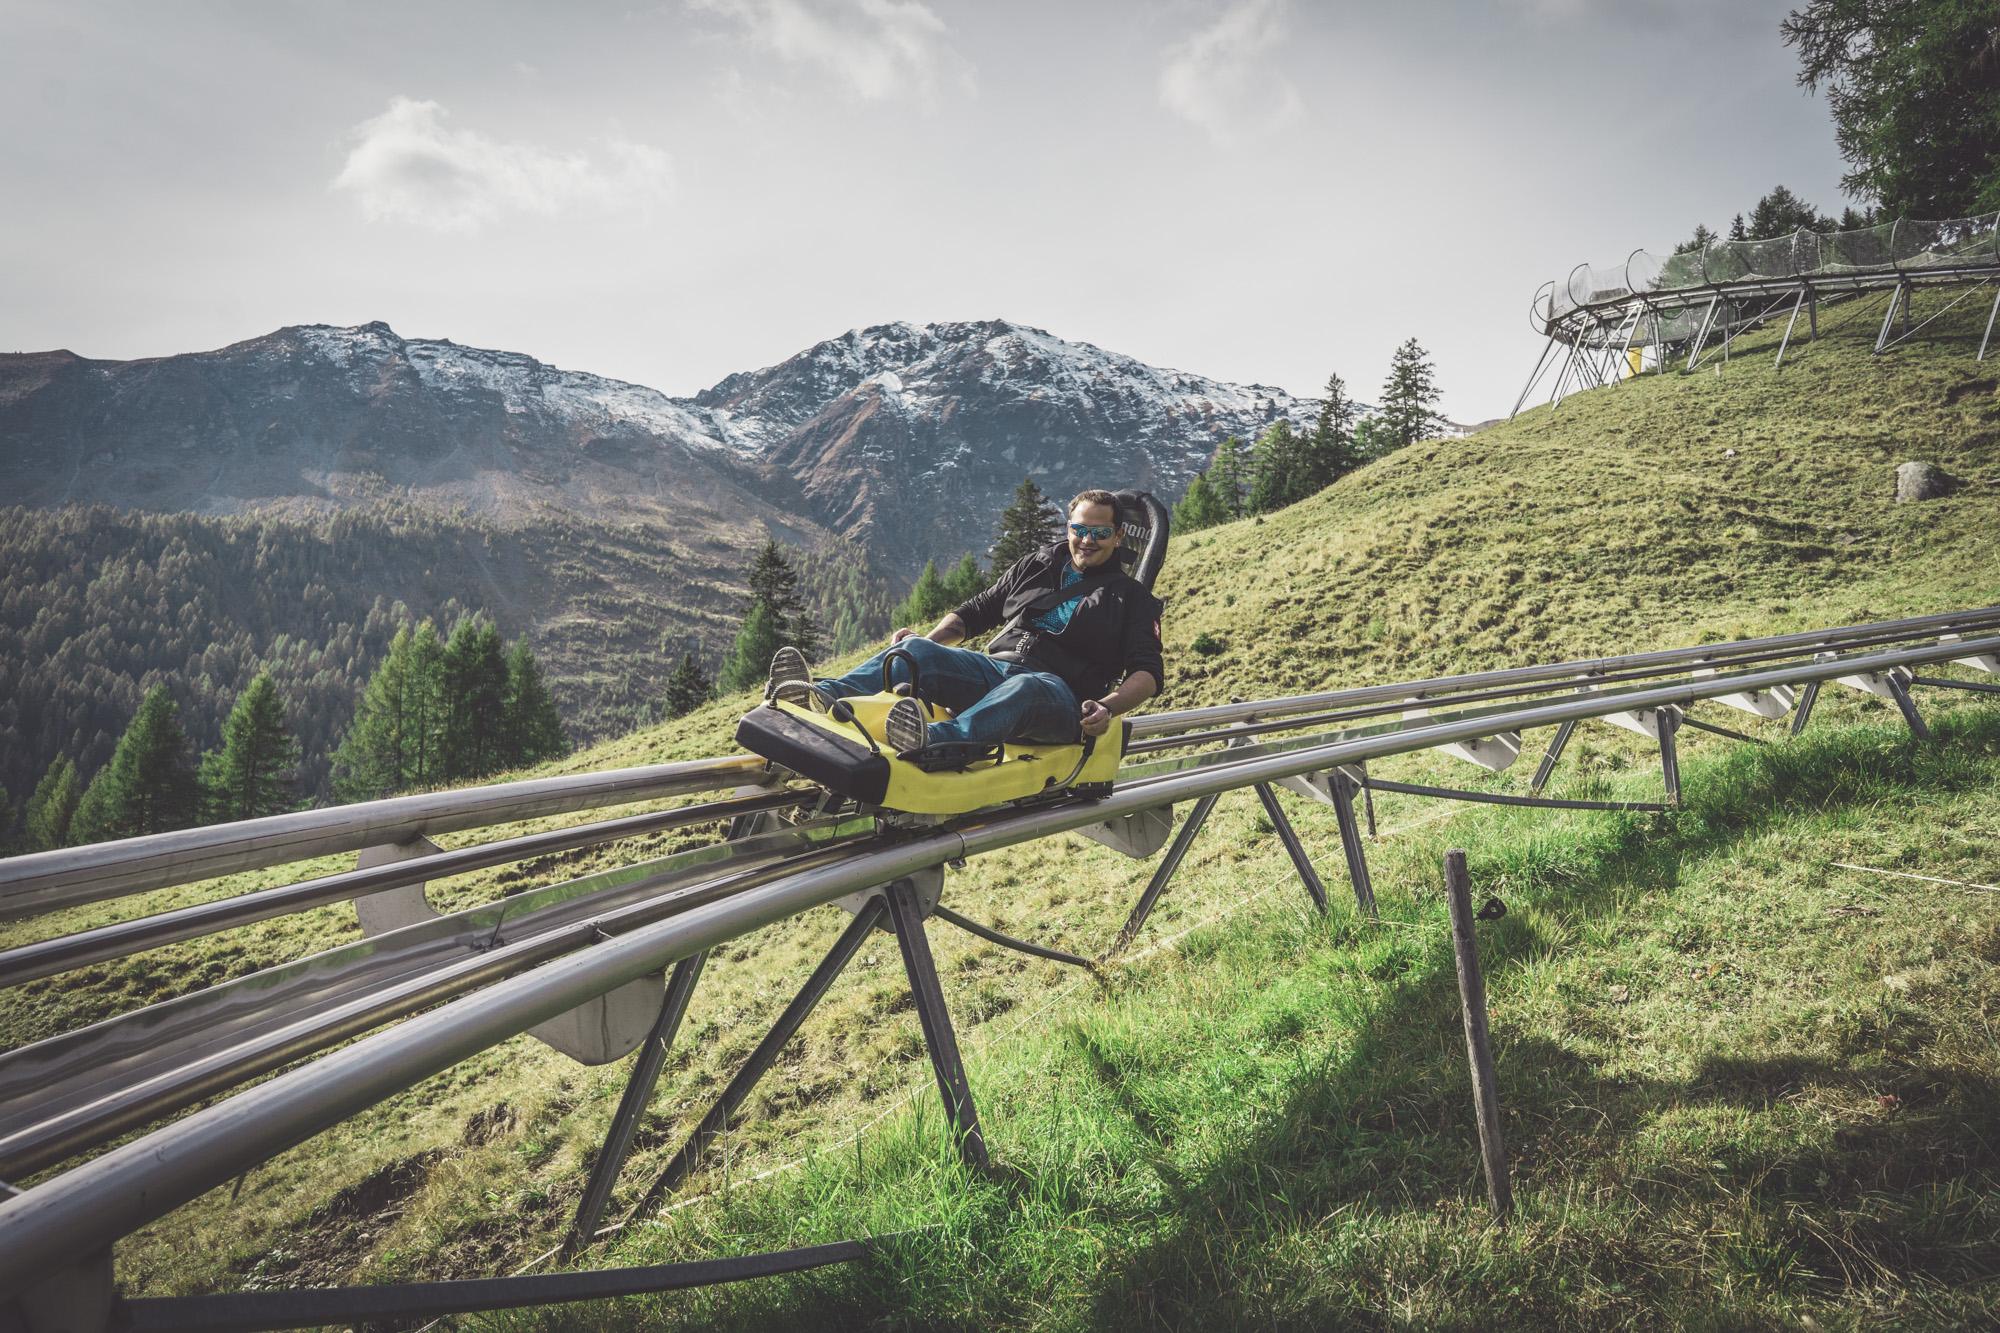 Longest toboggan run in Switzerland | Pradaschier toboggan run